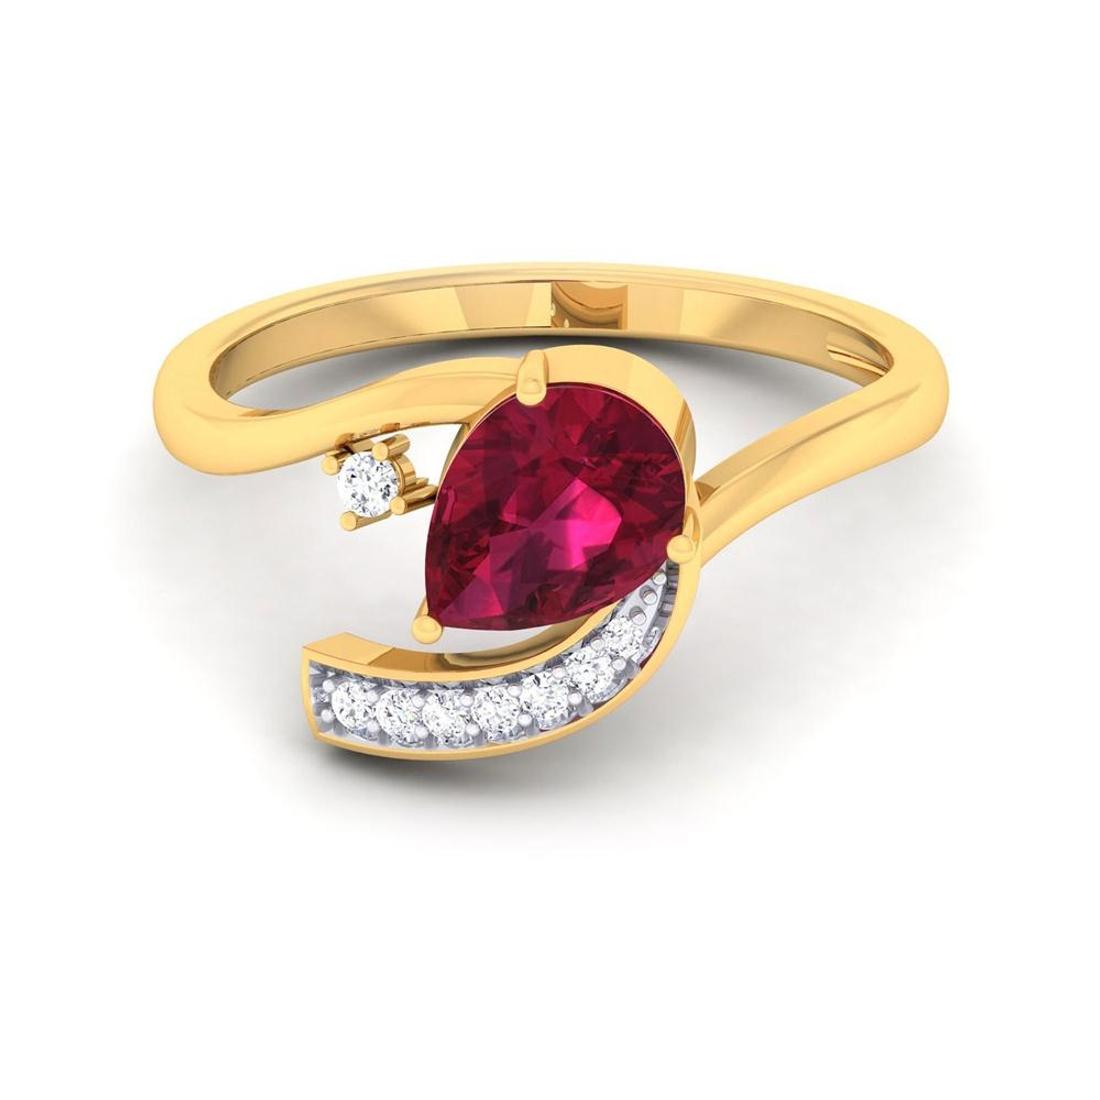 Buy Charu Jewels Diamond Ladies Ring CJLR0843 Online in India